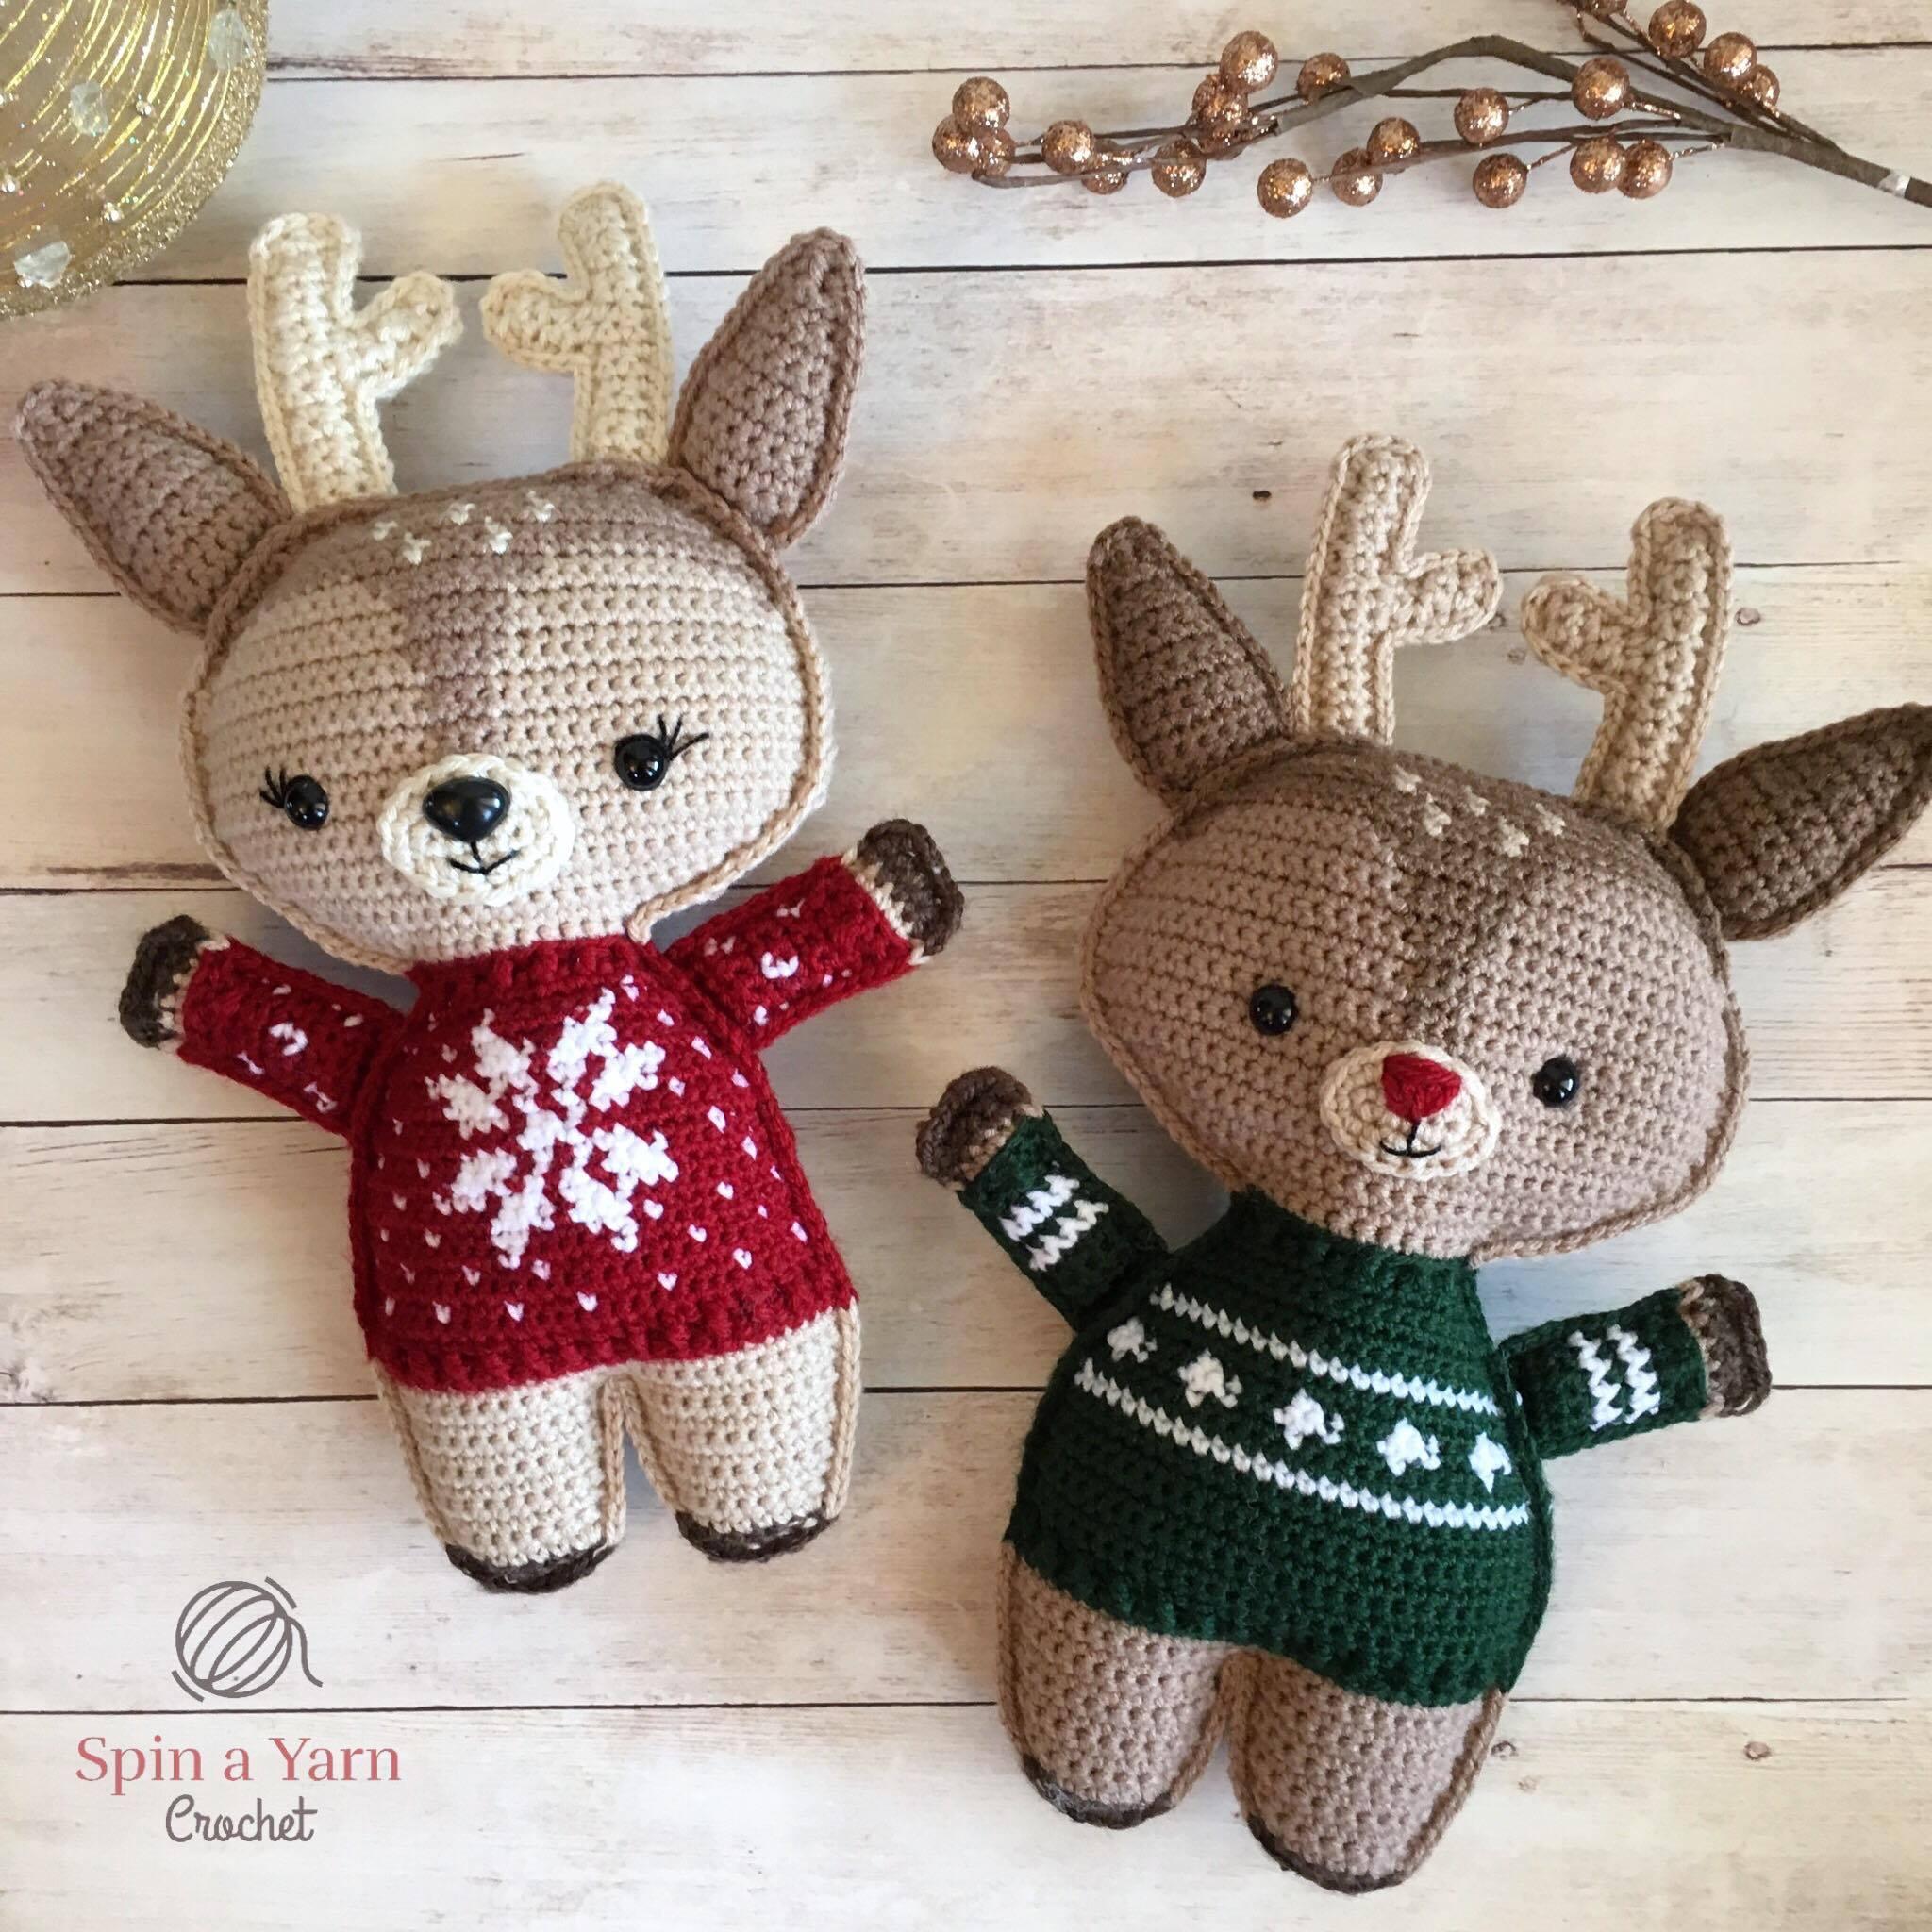 Holiday deer free crochet pattern part 2 spin a yarn crochet reindeer wearing sweaters bankloansurffo Choice Image